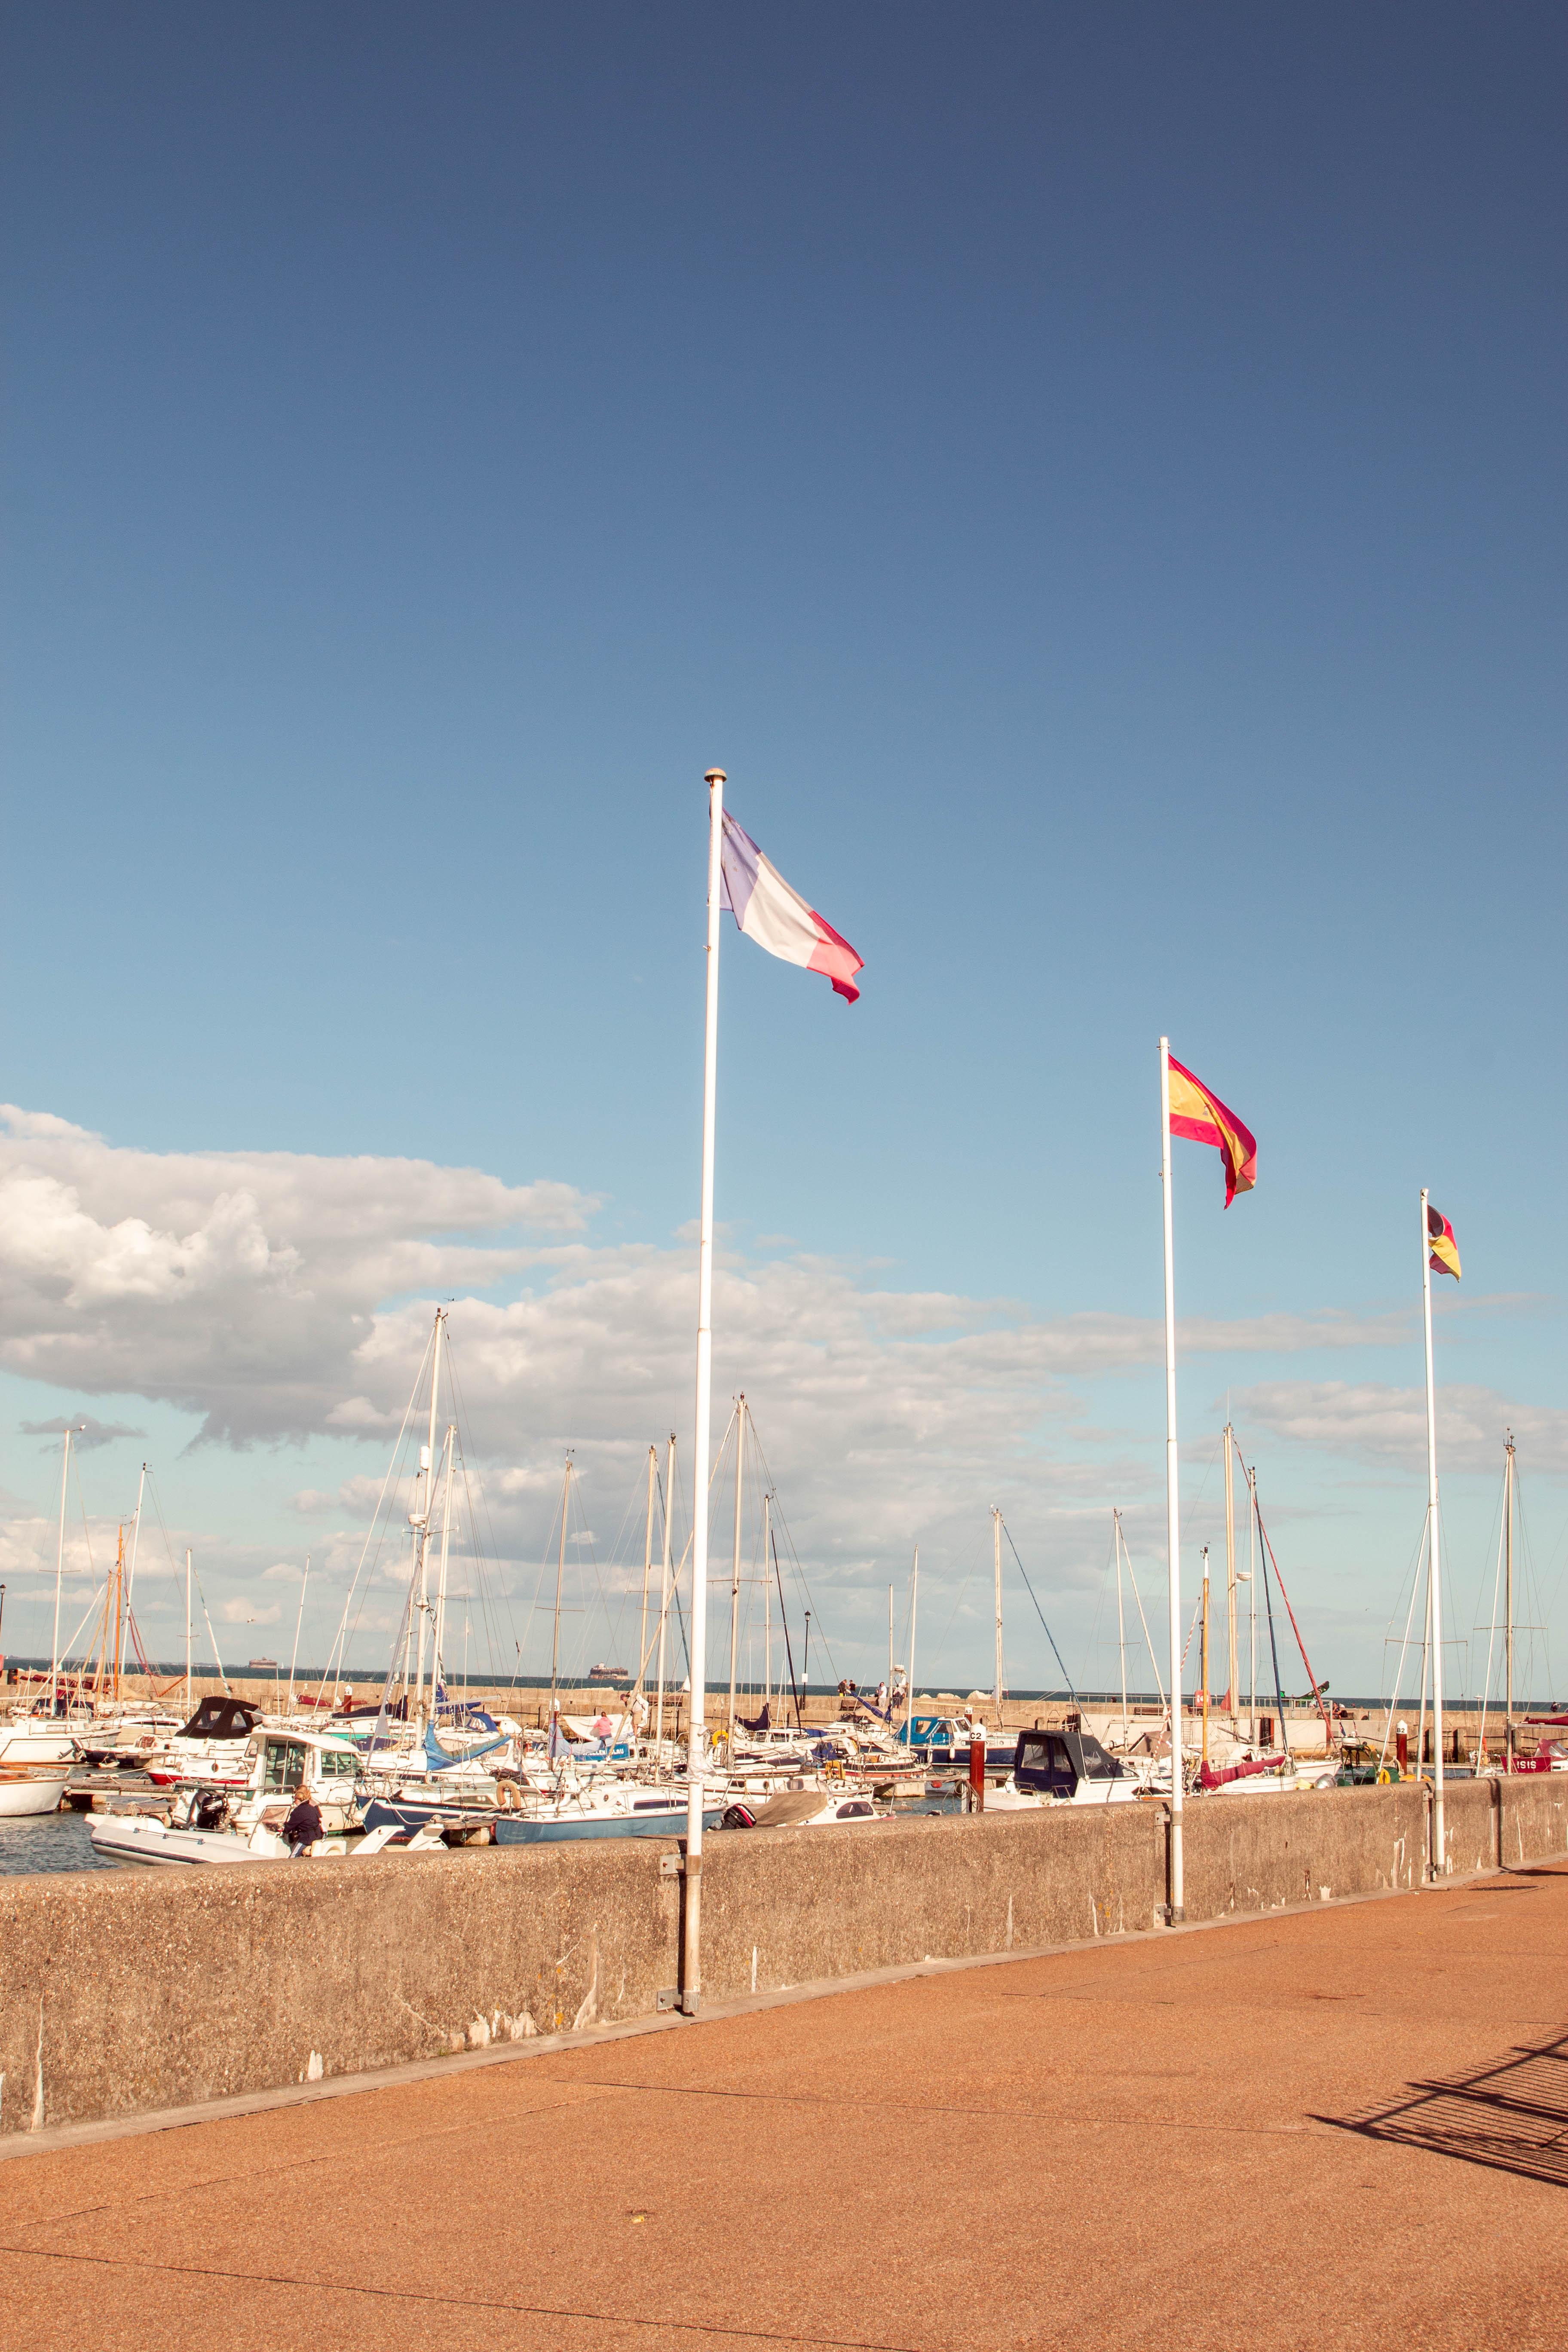 Ryde harbour